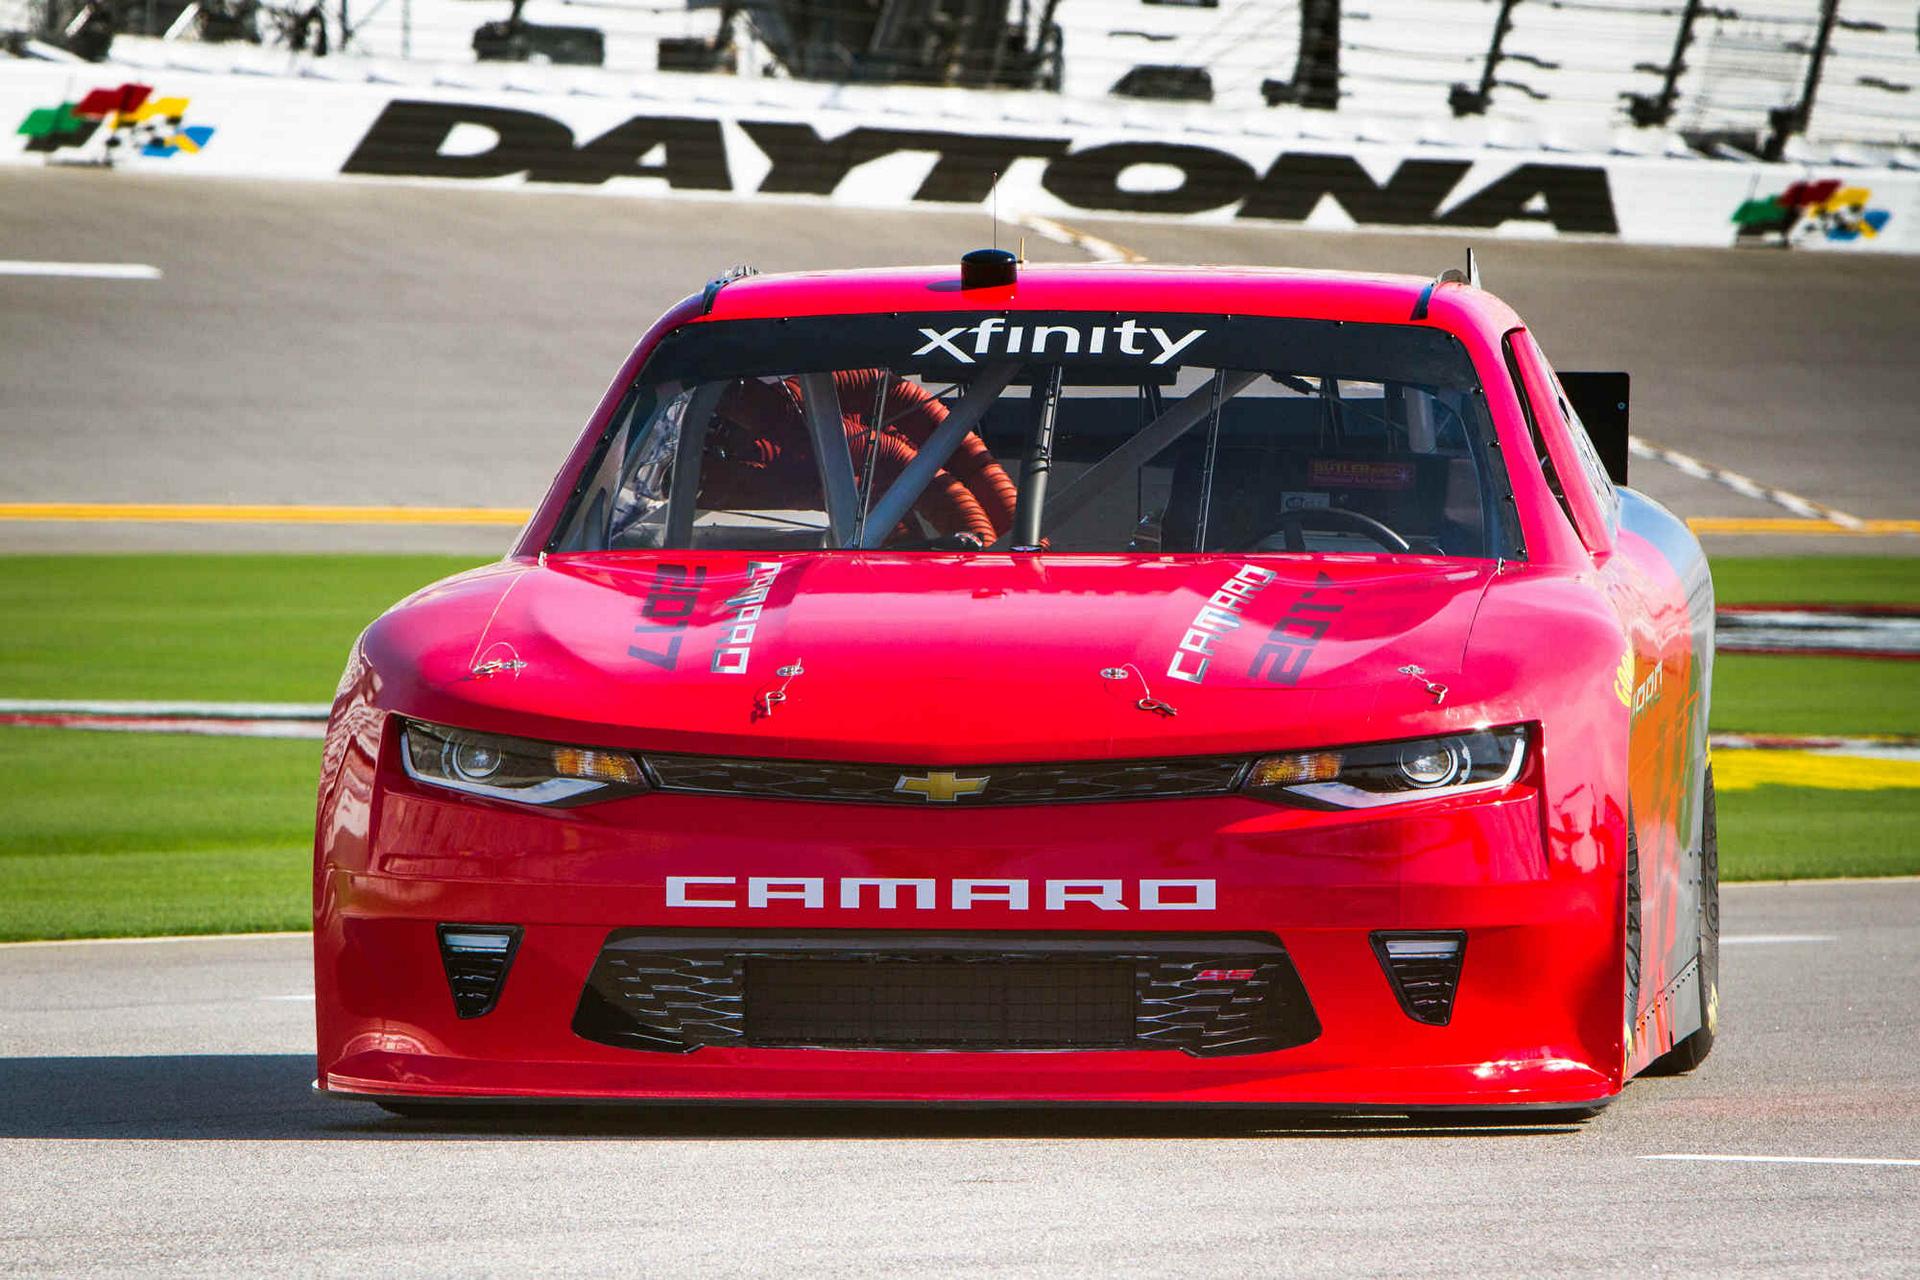 2017 Camaro NASCAR Xfinity Series Chevrolet Unveiled © General Motors